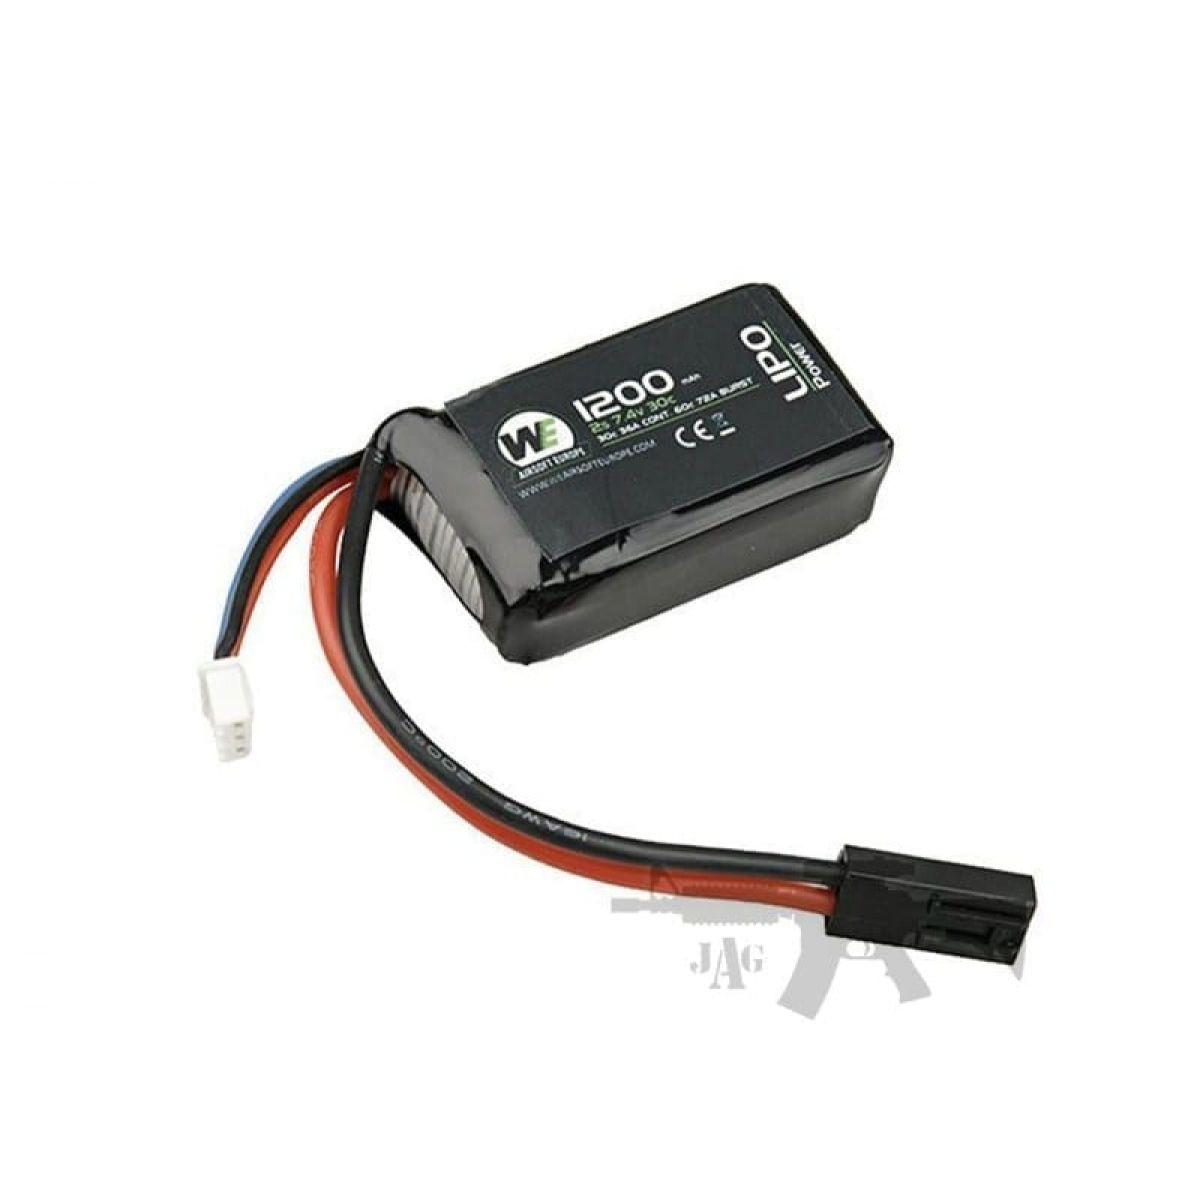 WE 1200MAH 7.4V 20CS Lipo AEG RIFLE Battery